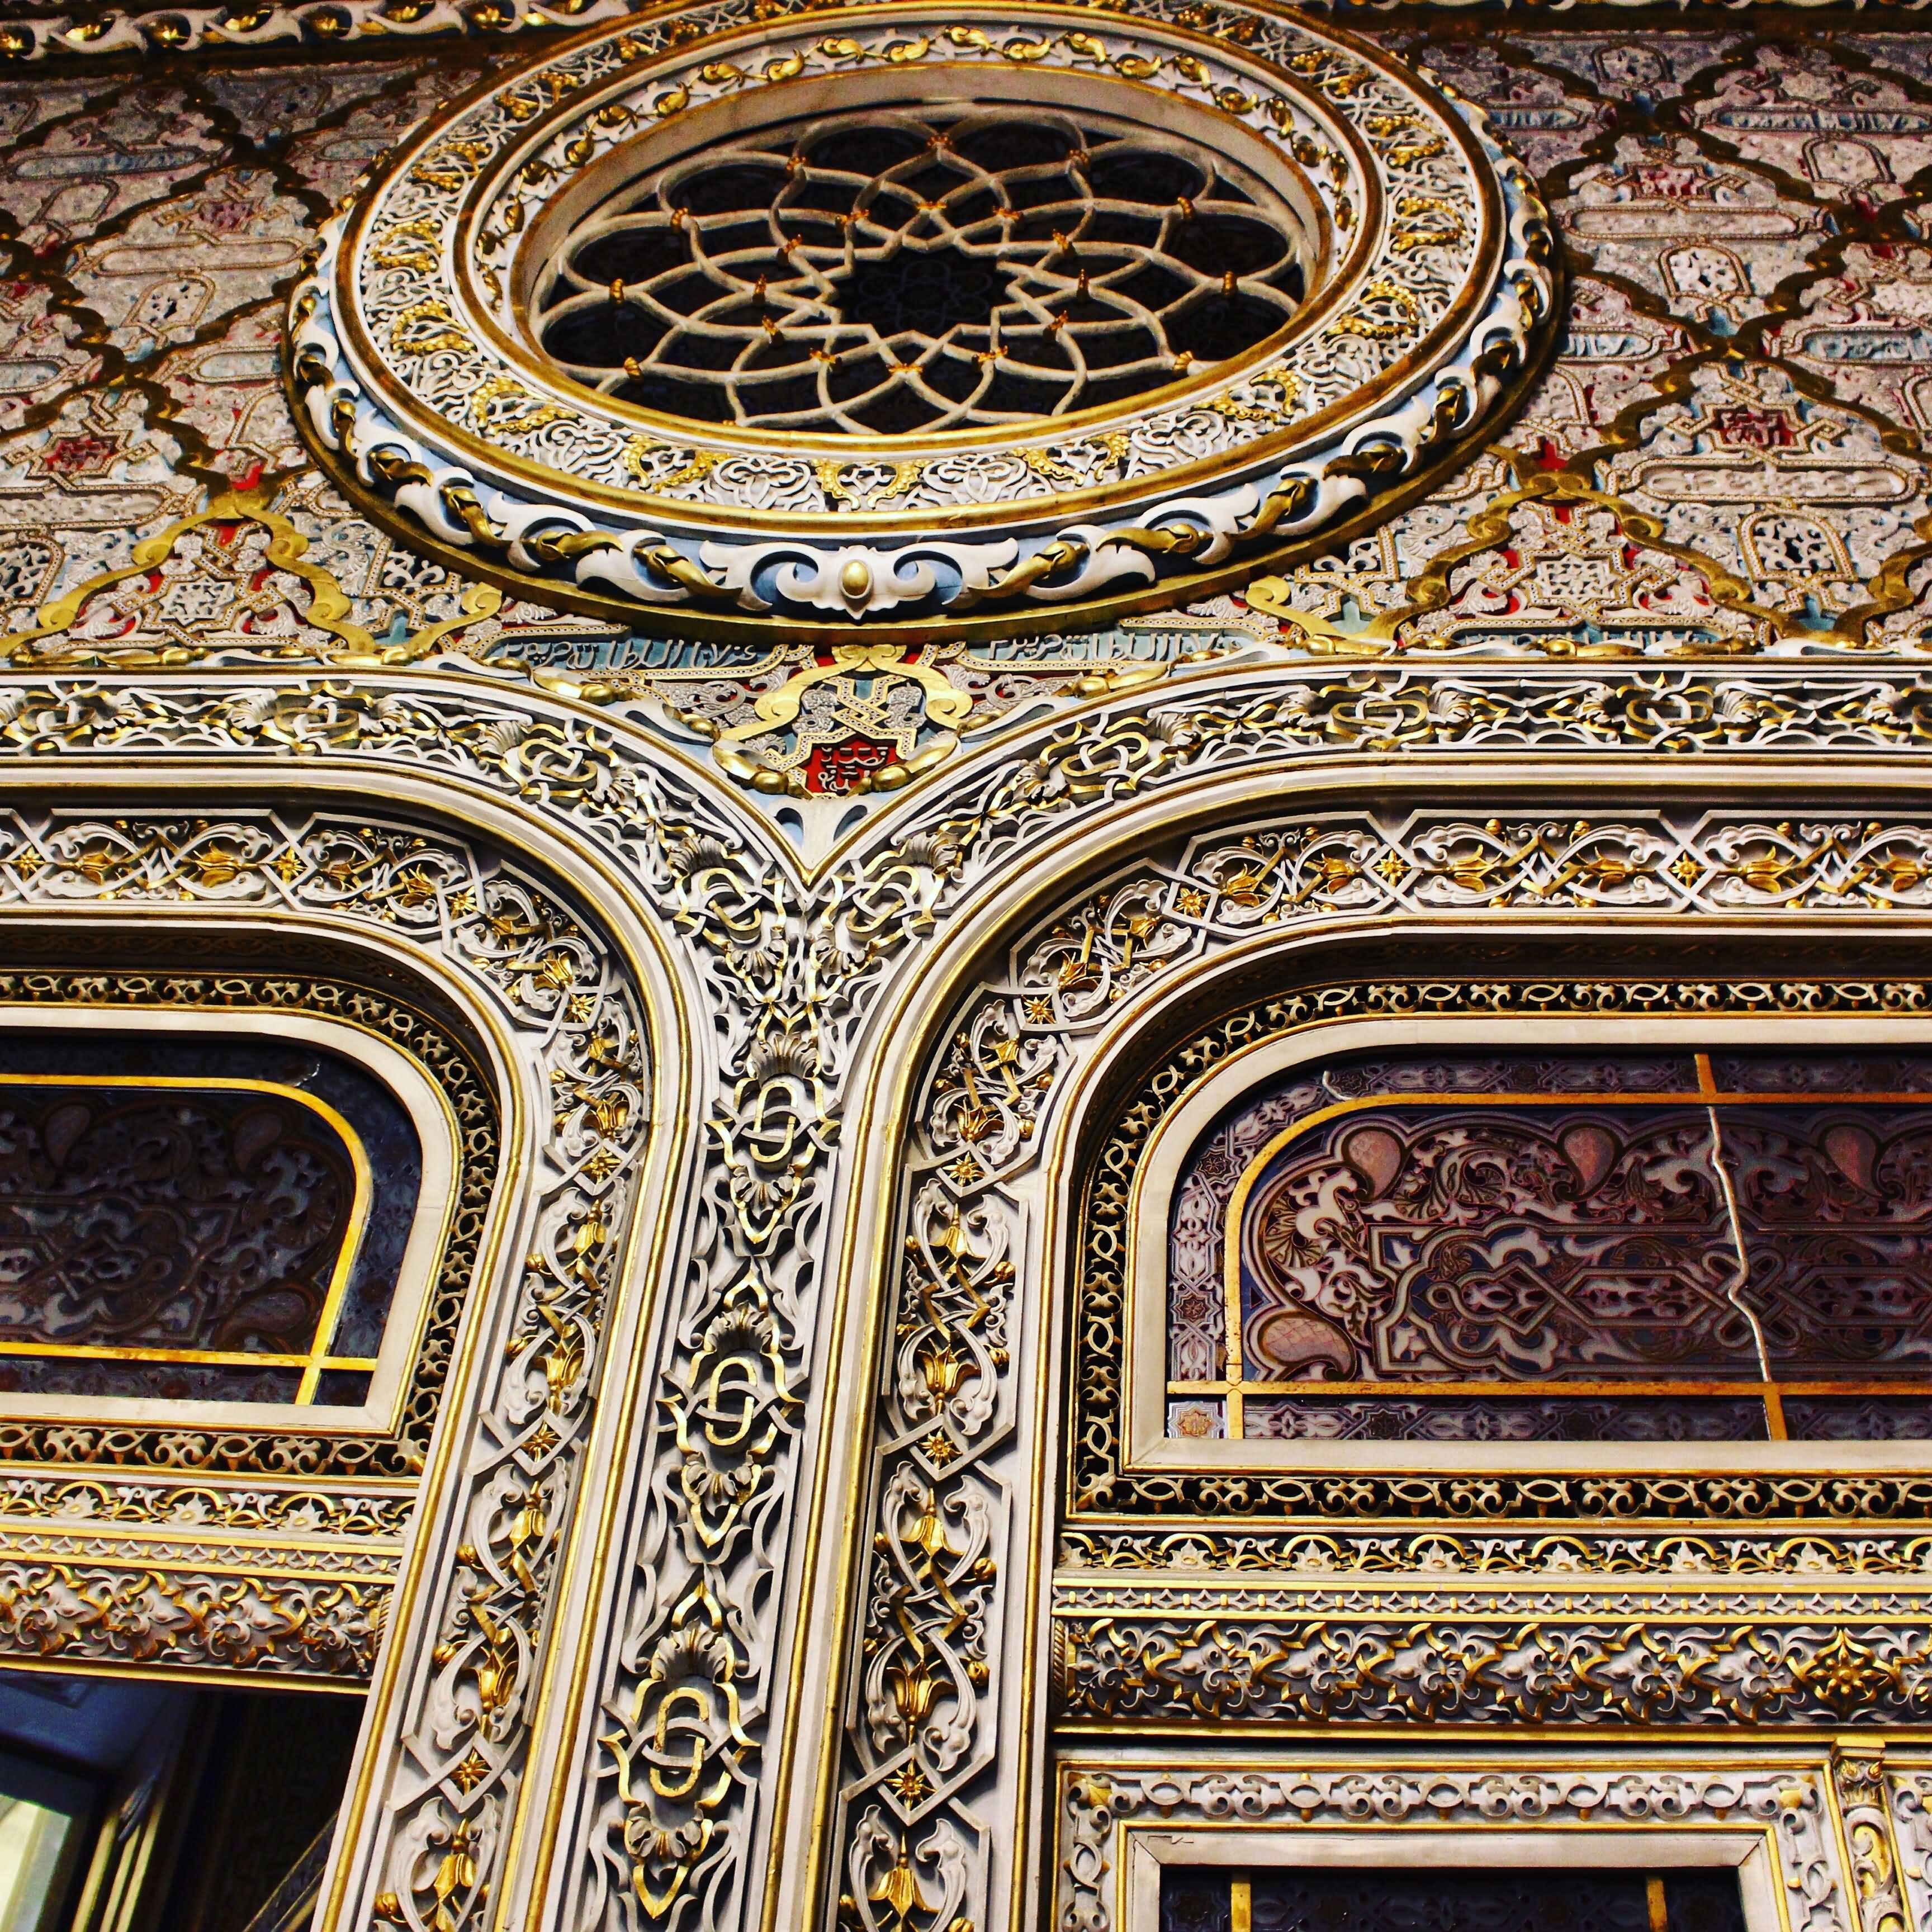 Adorable Wall Architecture Inside The Palacio da Bolsa